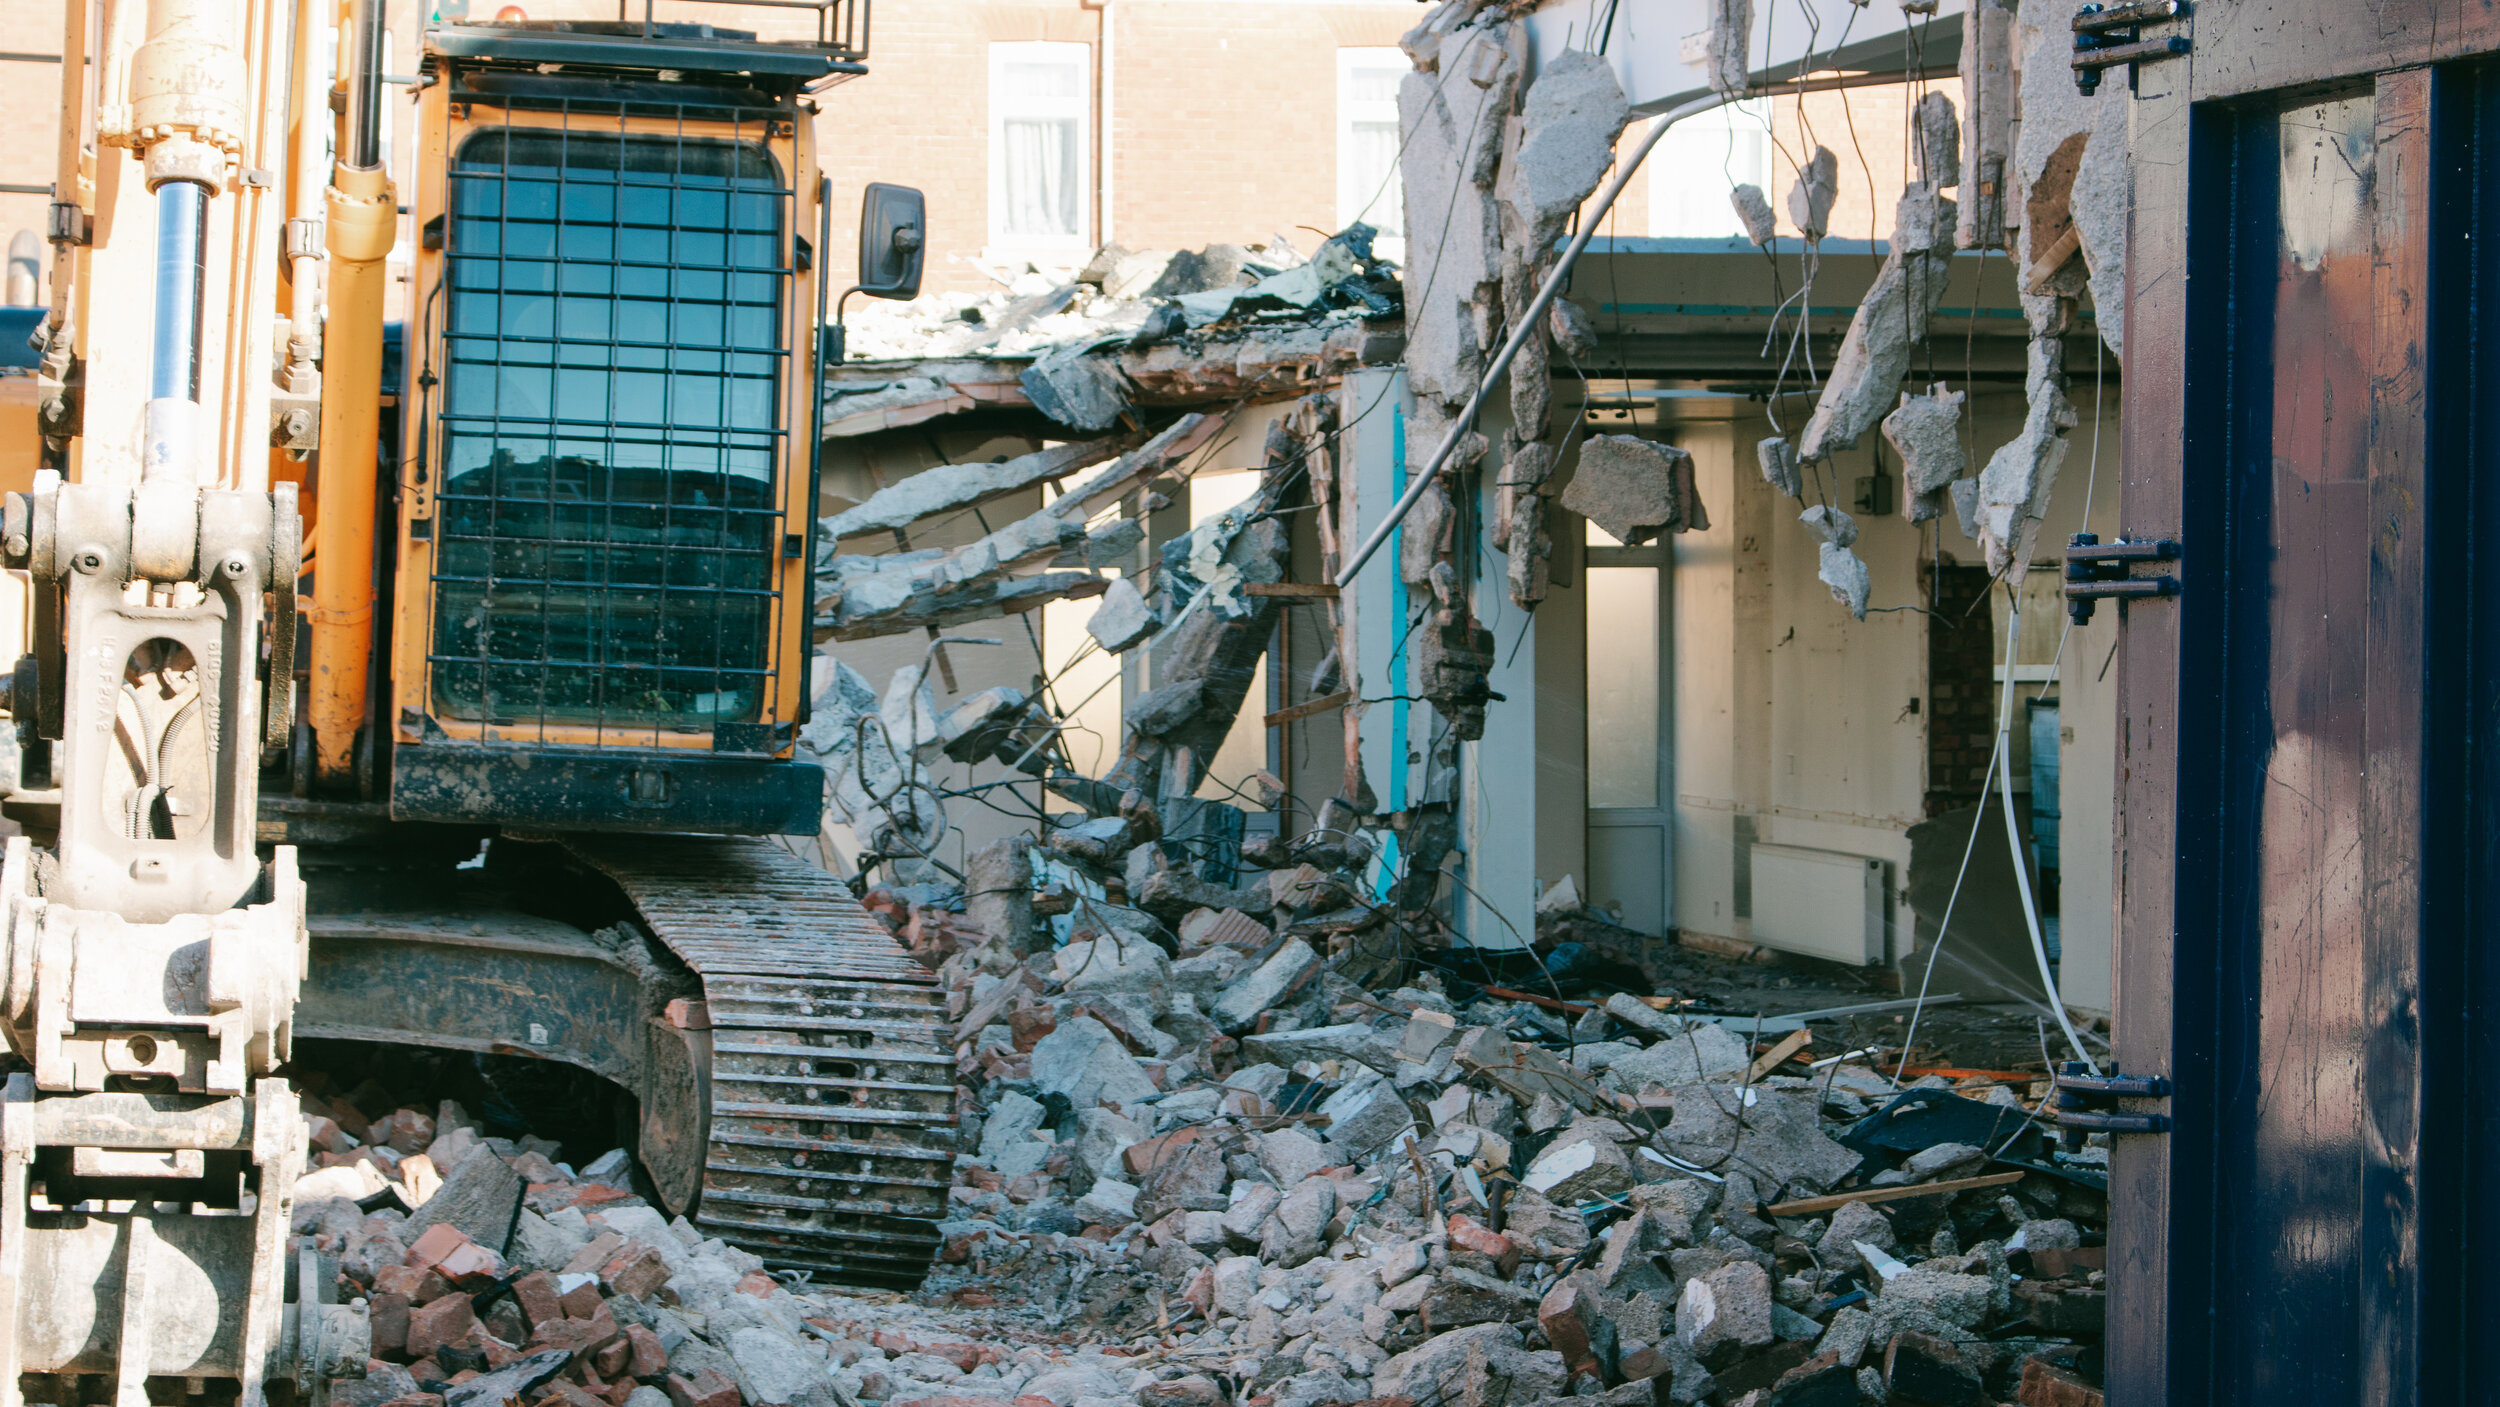 st-johns-harborne-bfm-demolition-oct-19-je-2903.jpg